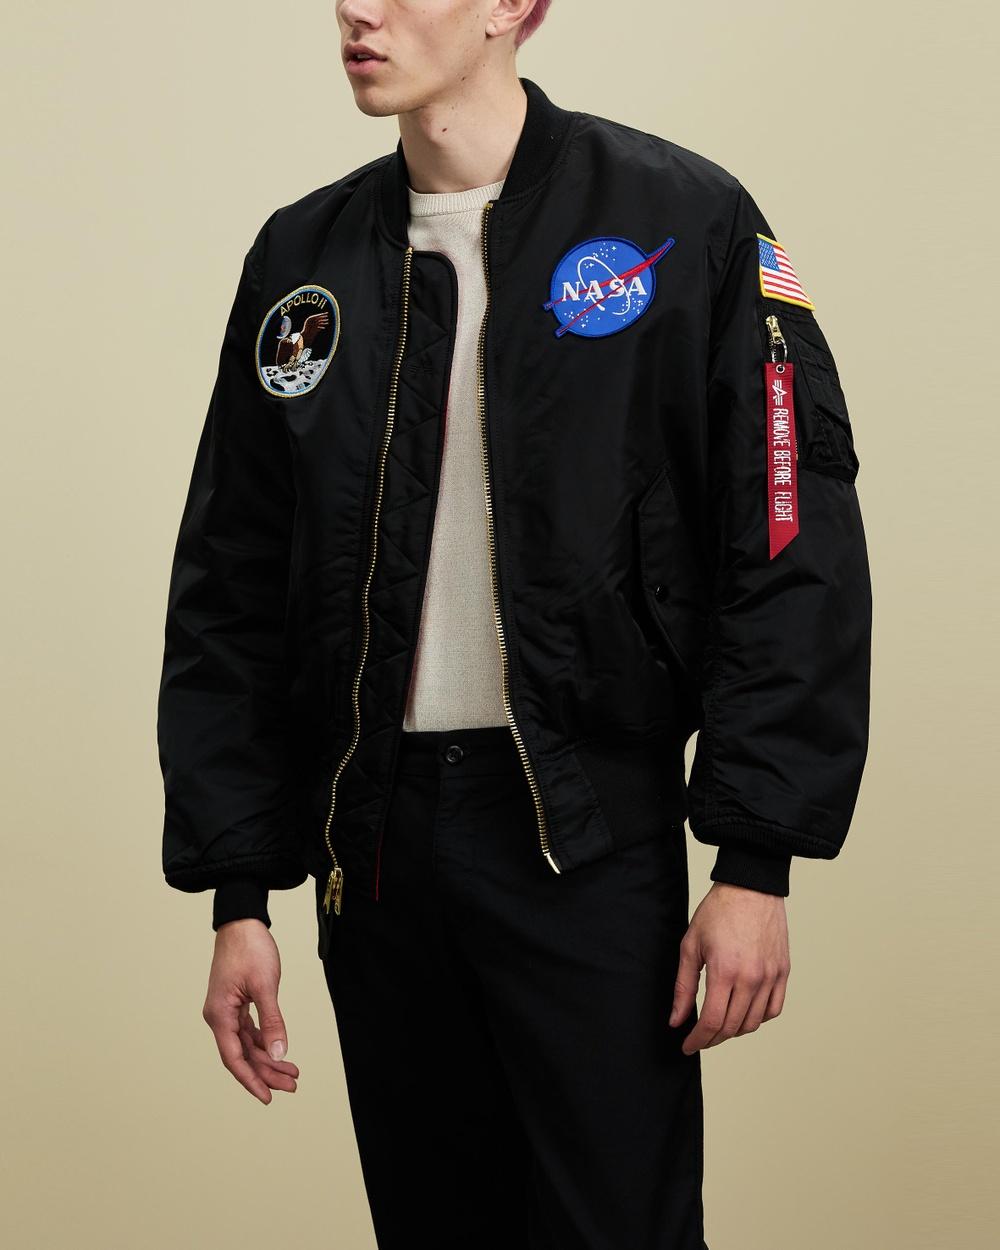 Alpha Industries Apollo MA 1 Flight Jacket Coats & Jackets Black Commander Red Lining MA-1